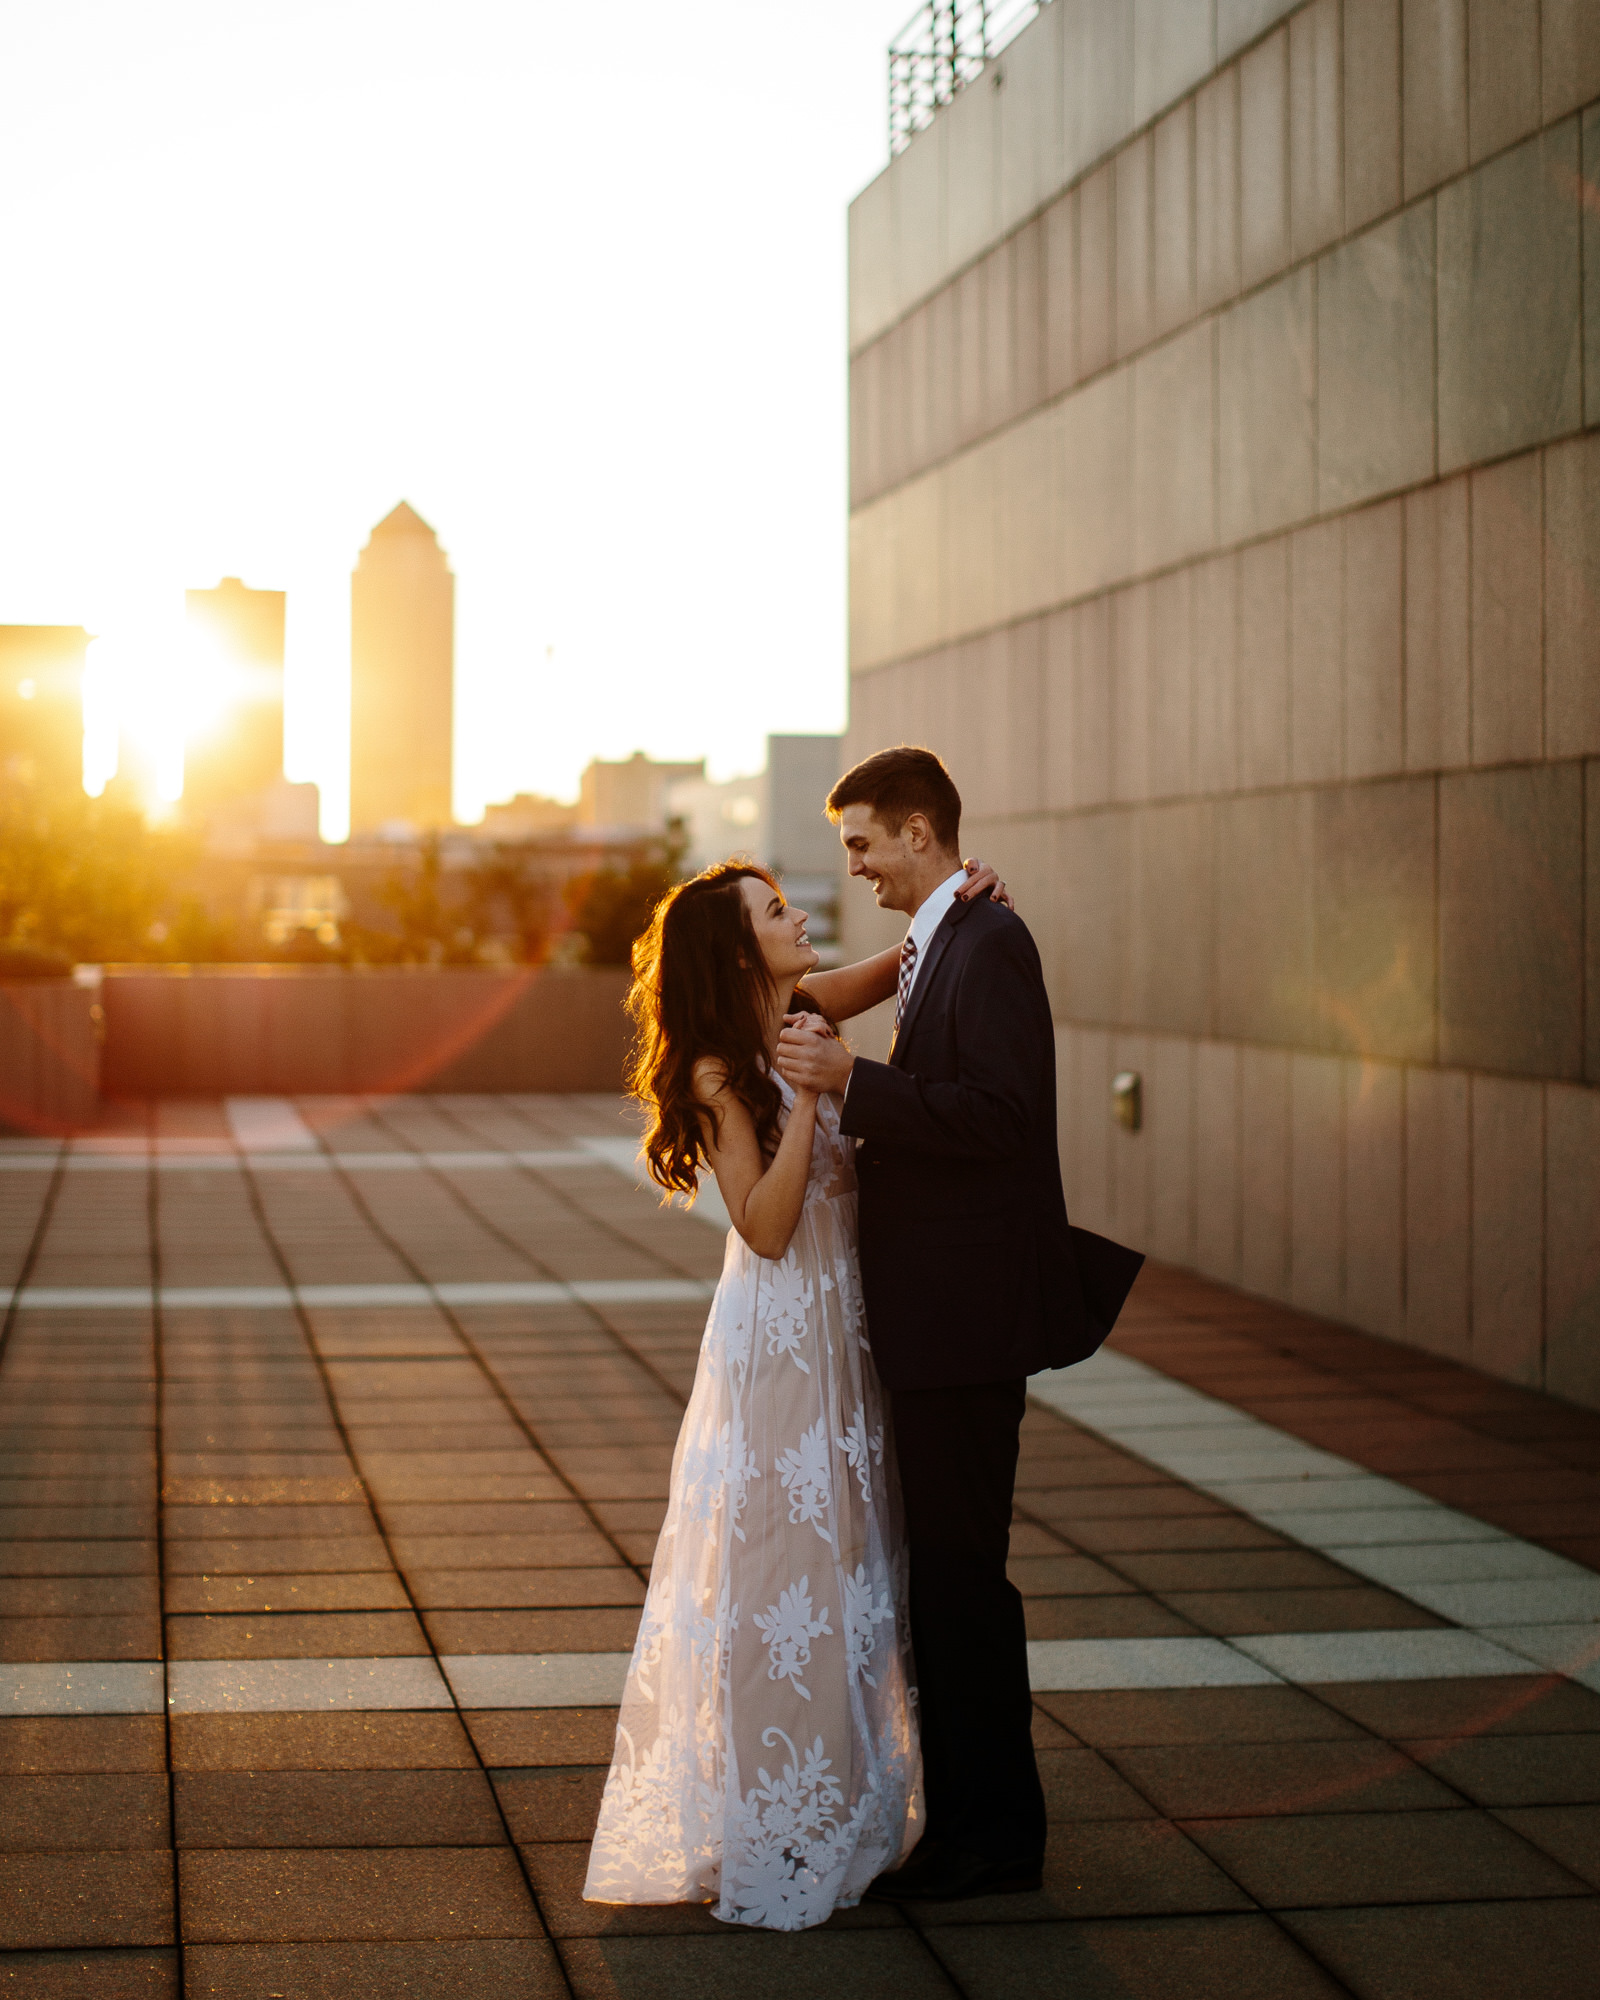 wedding-elopement-adventerous-romantic-timeless-des-moines-siouxfalls-photography-27.jpg